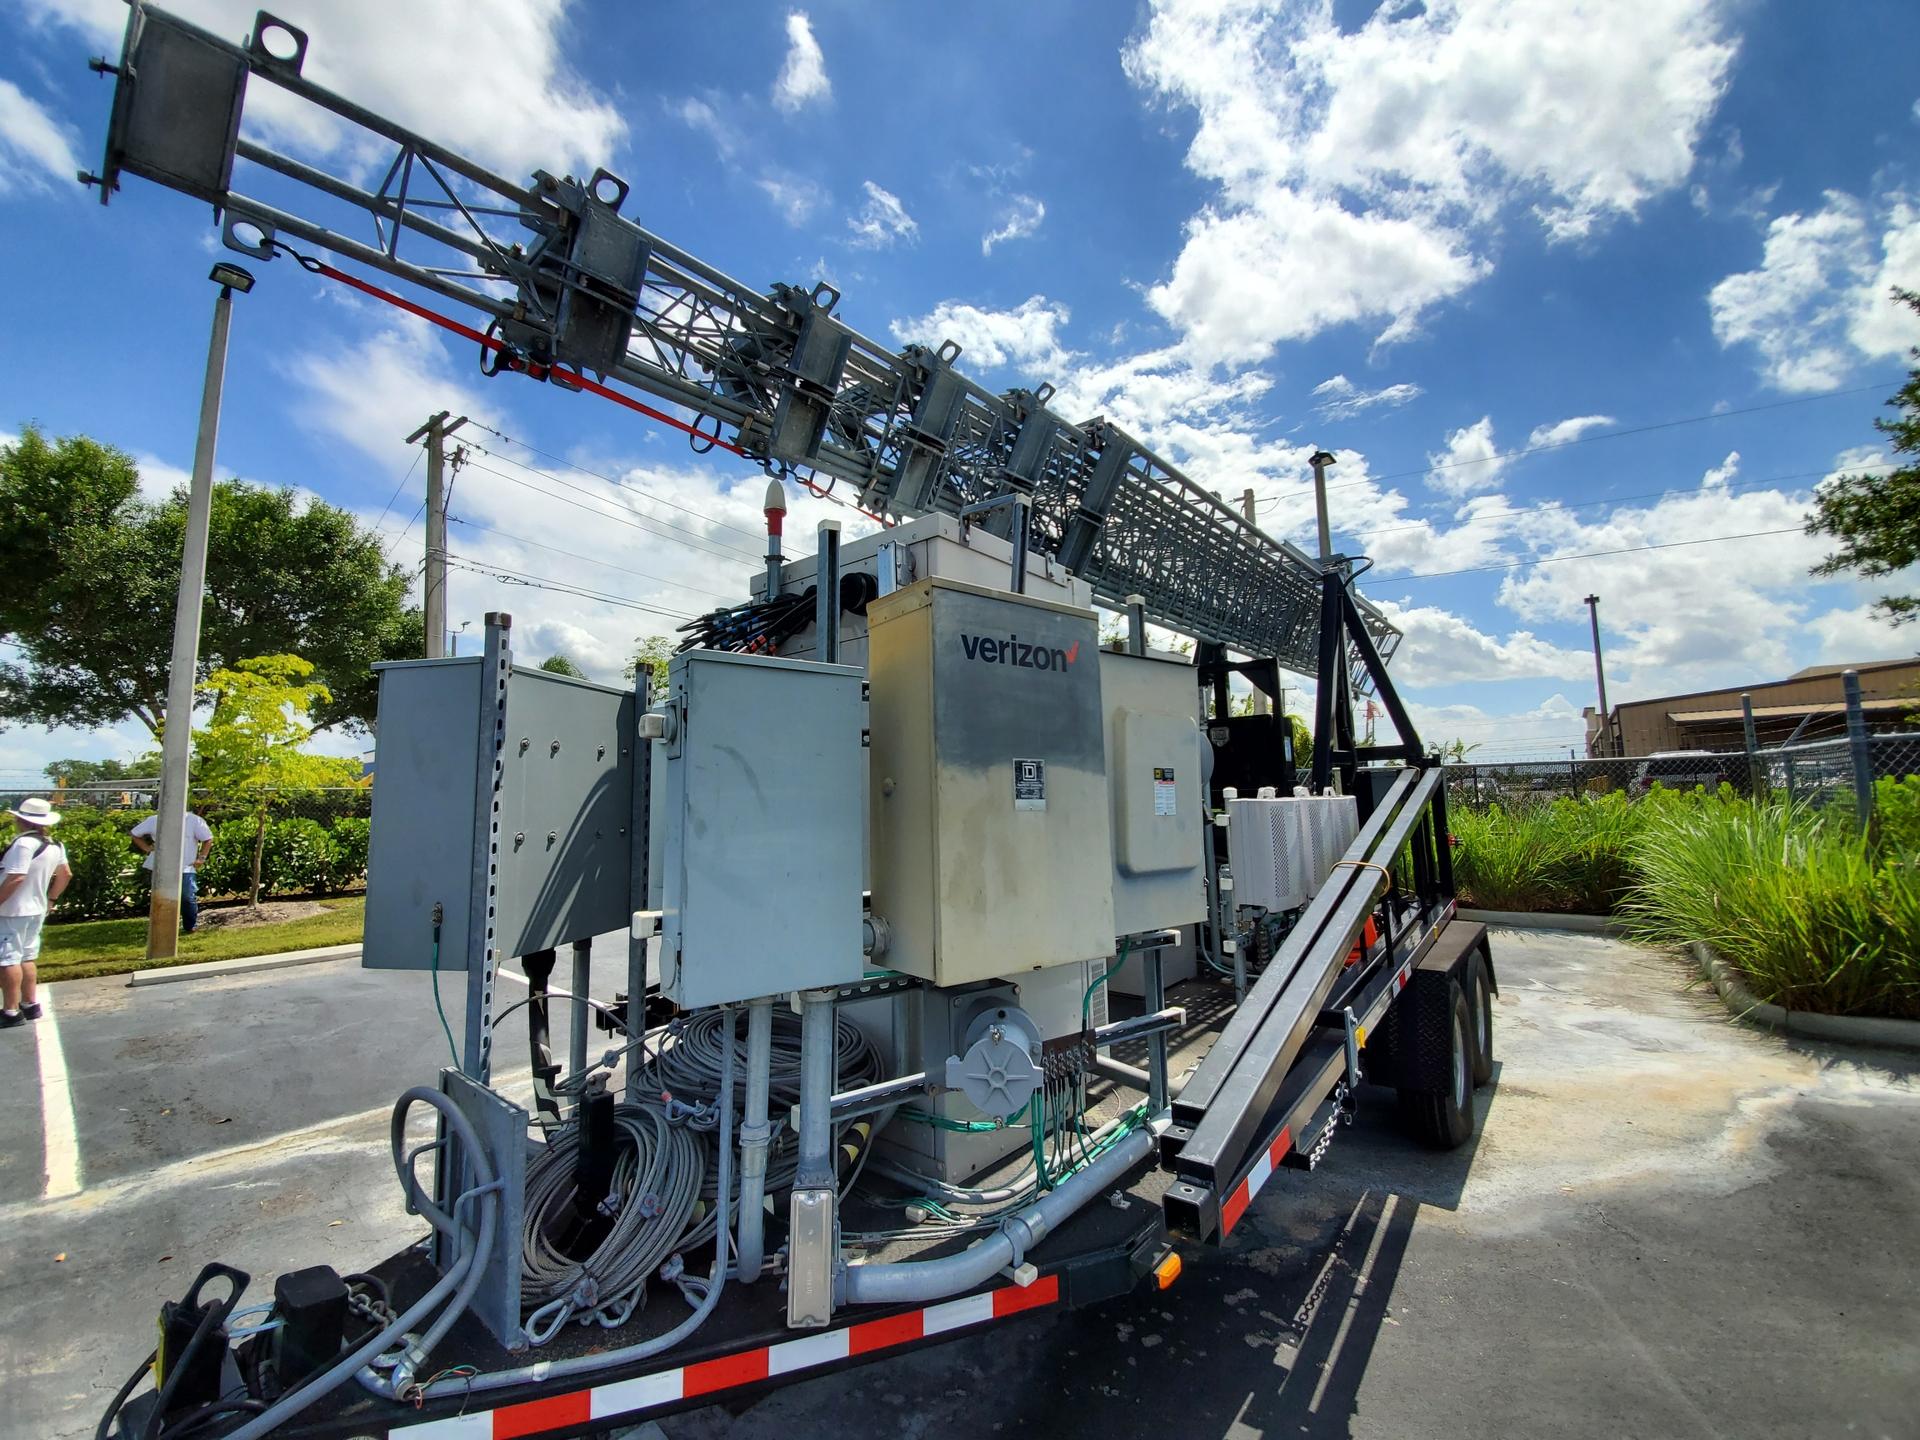 Verizon Response TOW (tower on wheels)